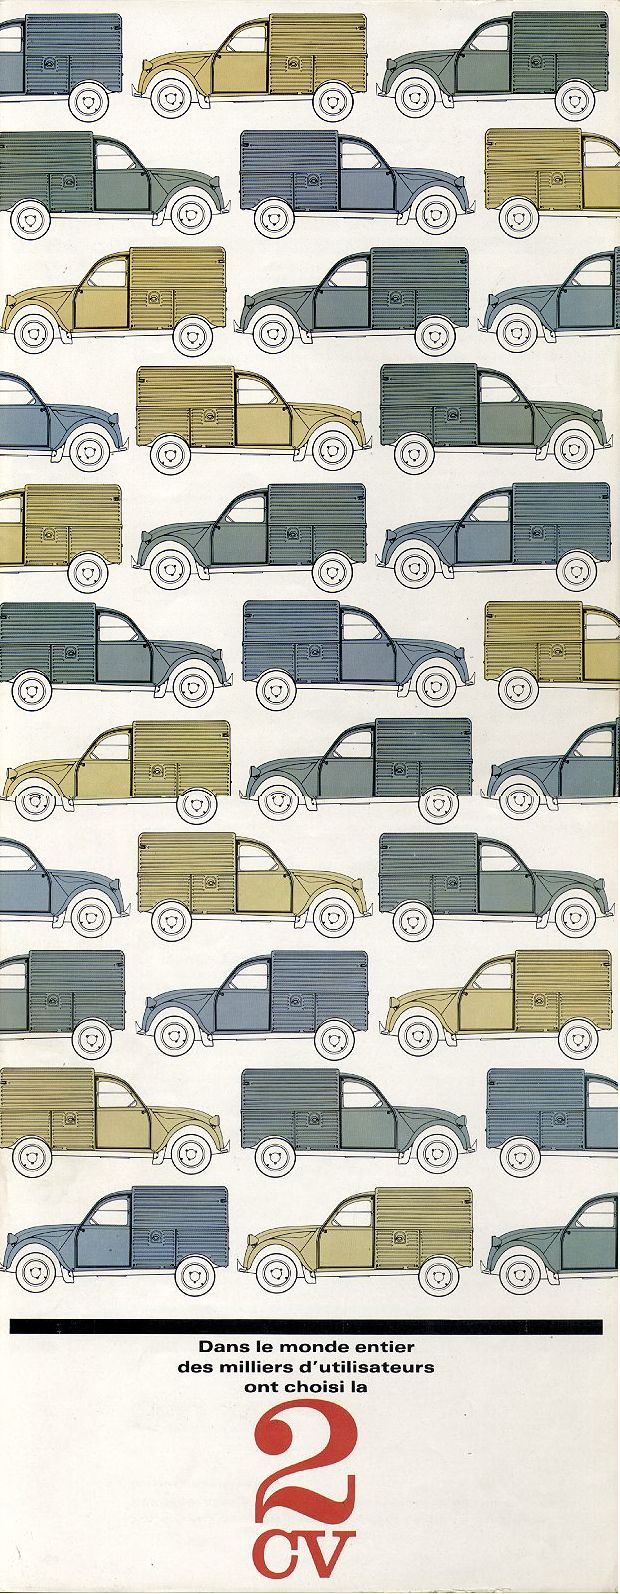 3212 best citroen images on pinterest car automobile and citron 2cv furgo 1963 vanachro Choice Image